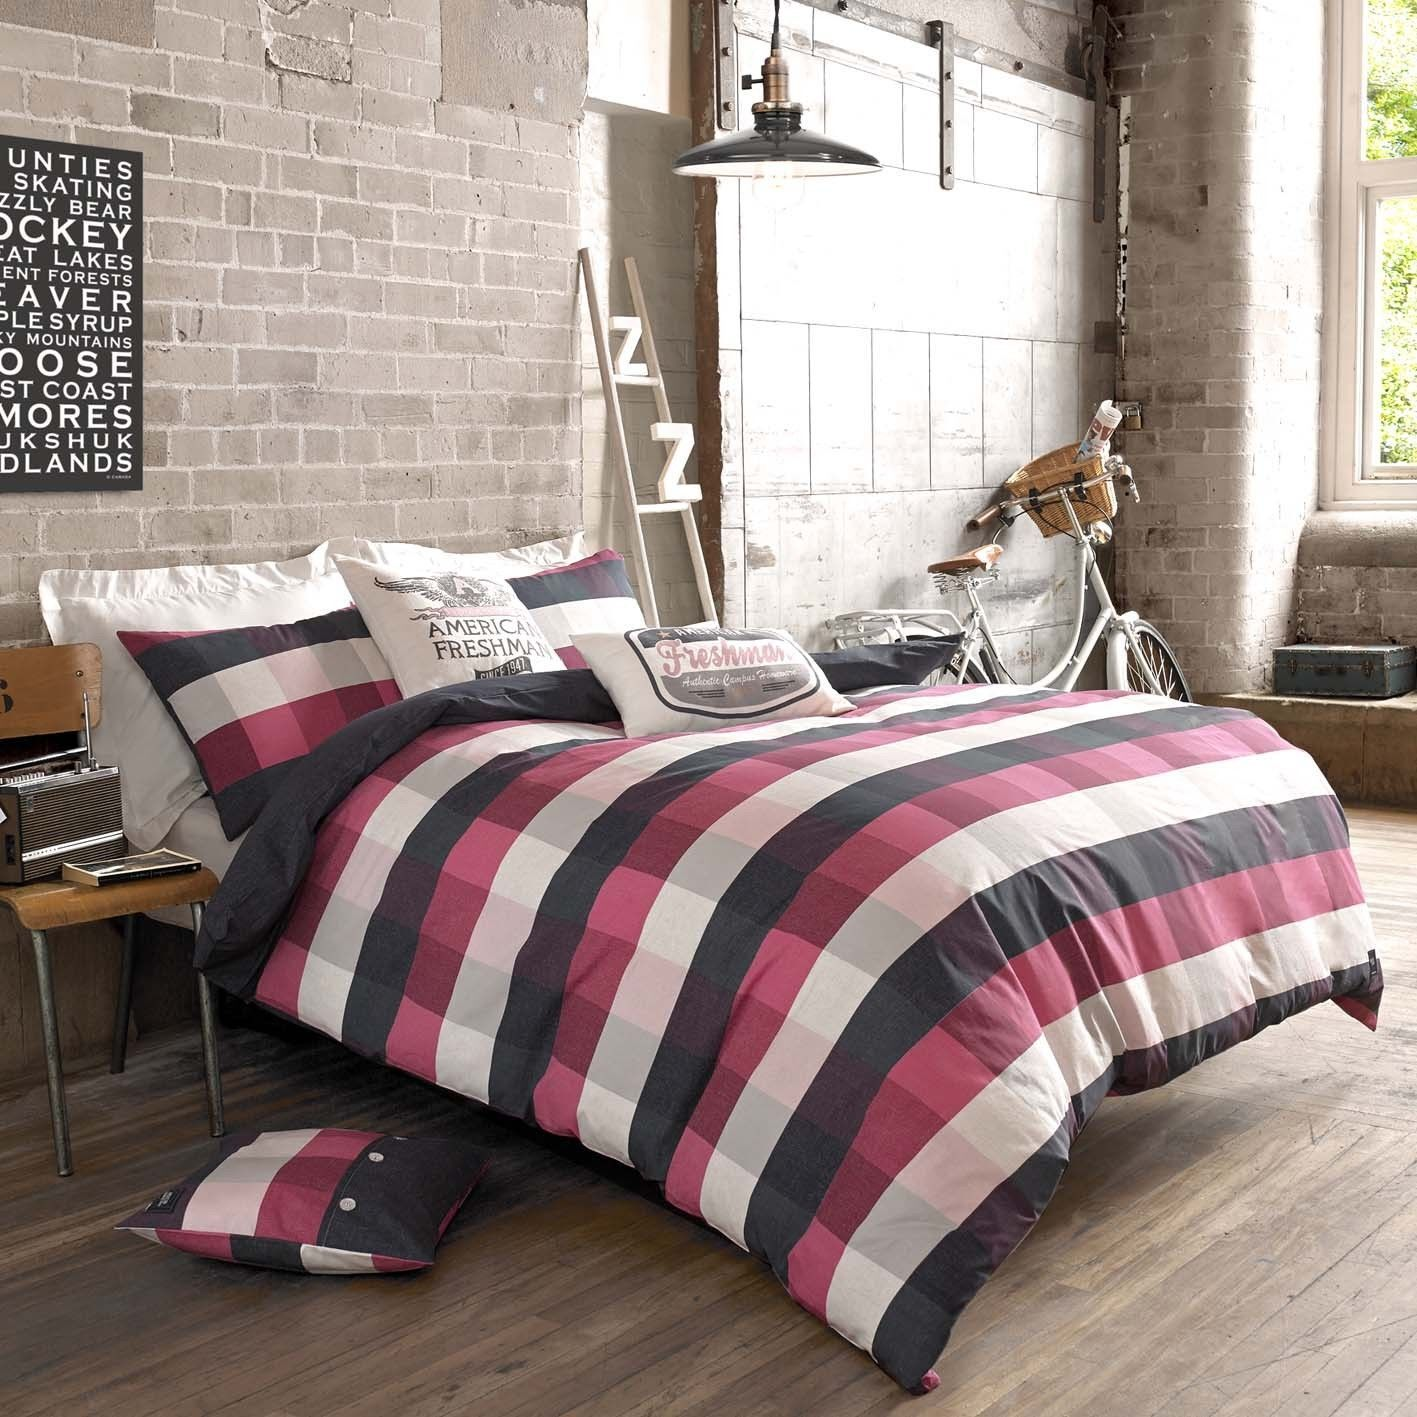 American Freshman ANDERSON Cotton Authentic Bedding Quilt Duvet Cover Set.